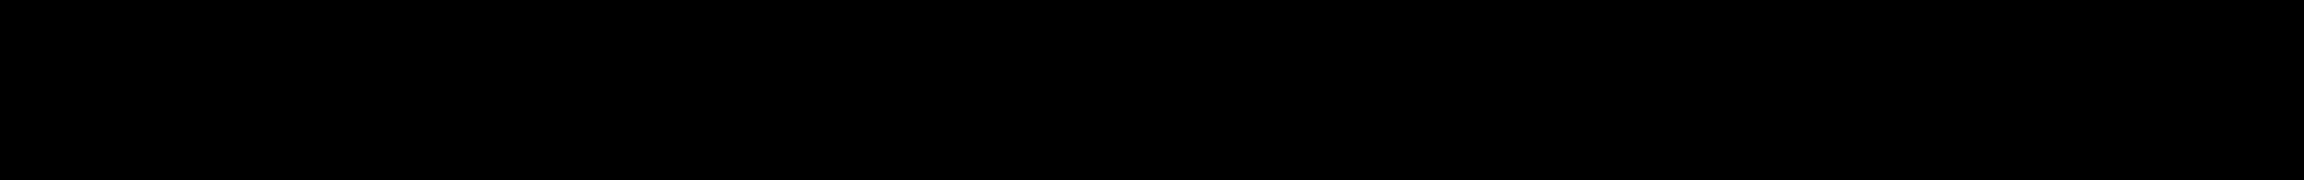 VRPRO-gradient.png